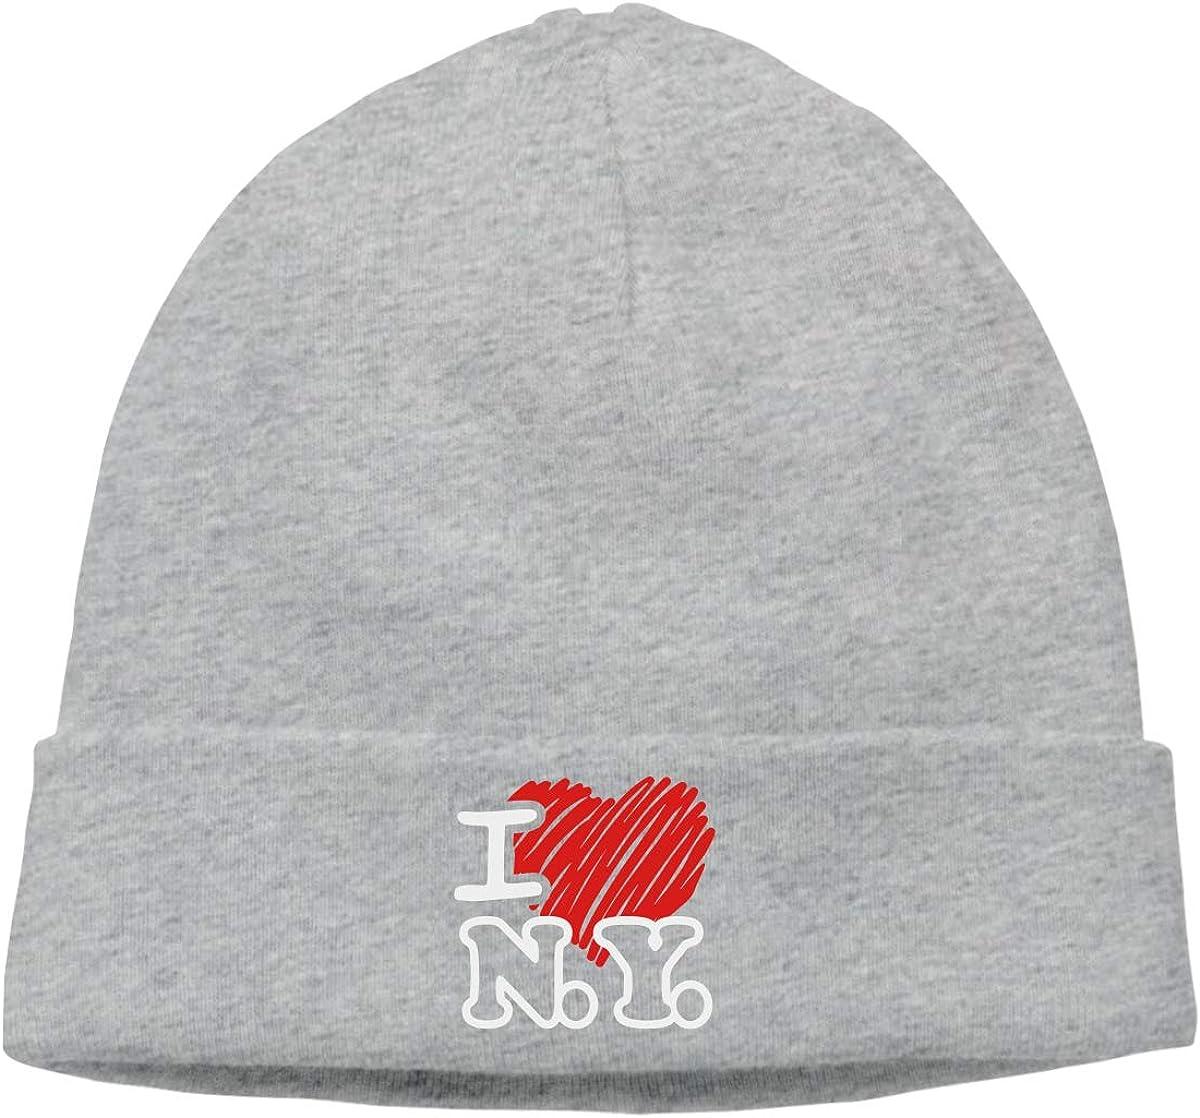 Unisex I Love New York Soft Knit Hats